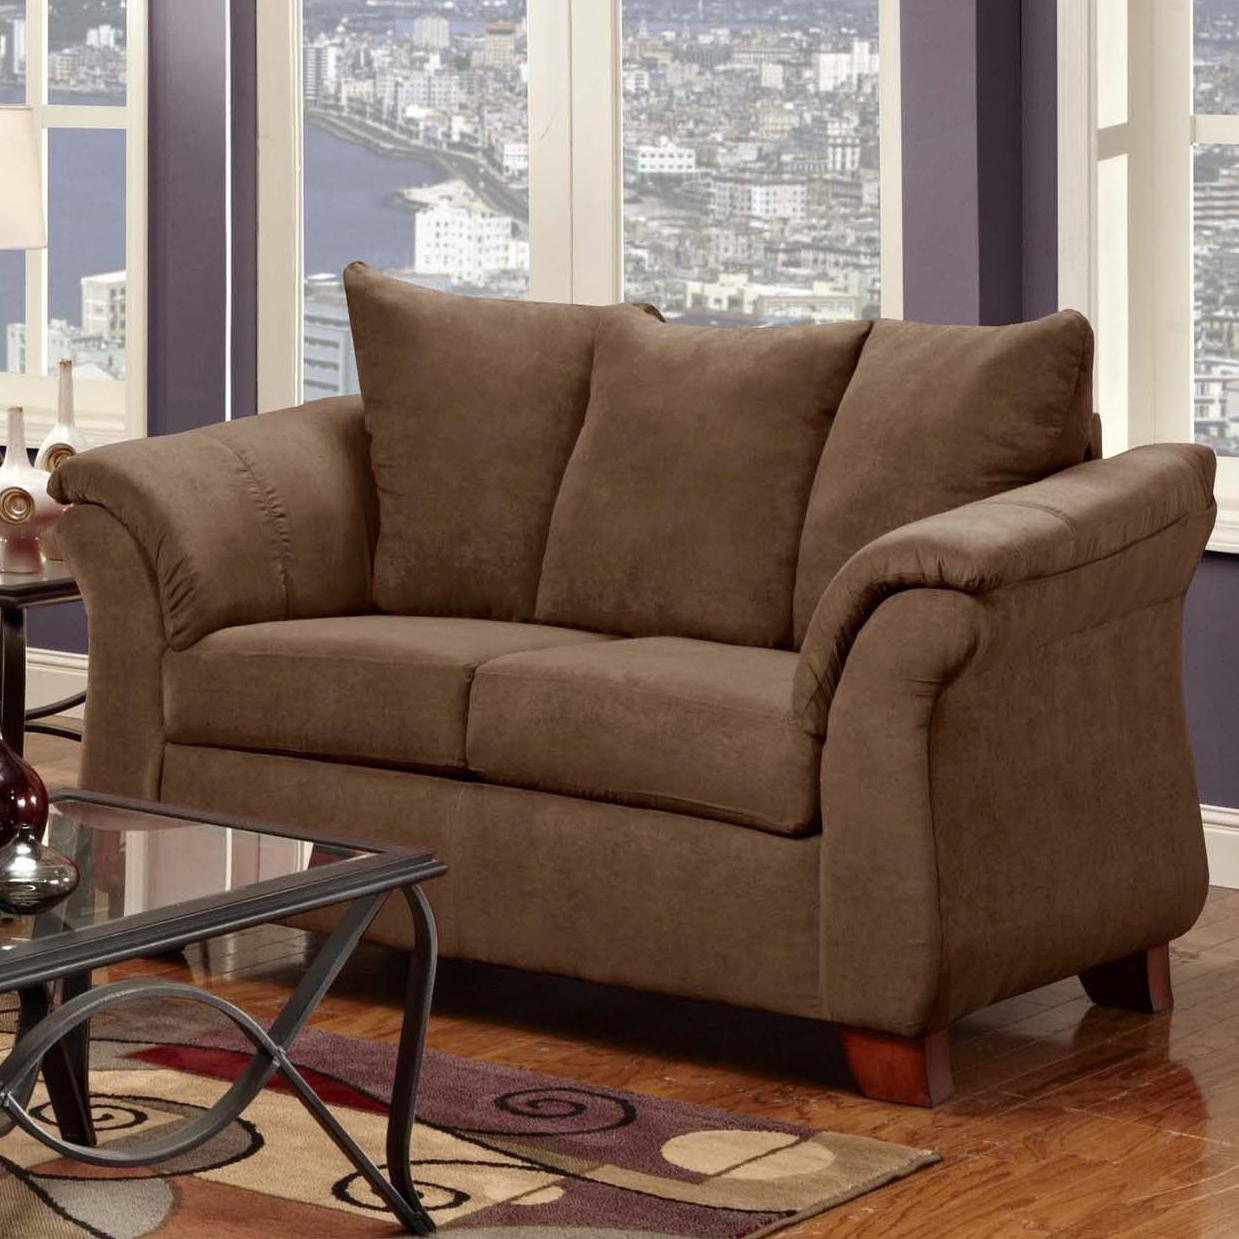 2000 Loveseat by Washington Furniture at Lynn's Furniture & Mattress